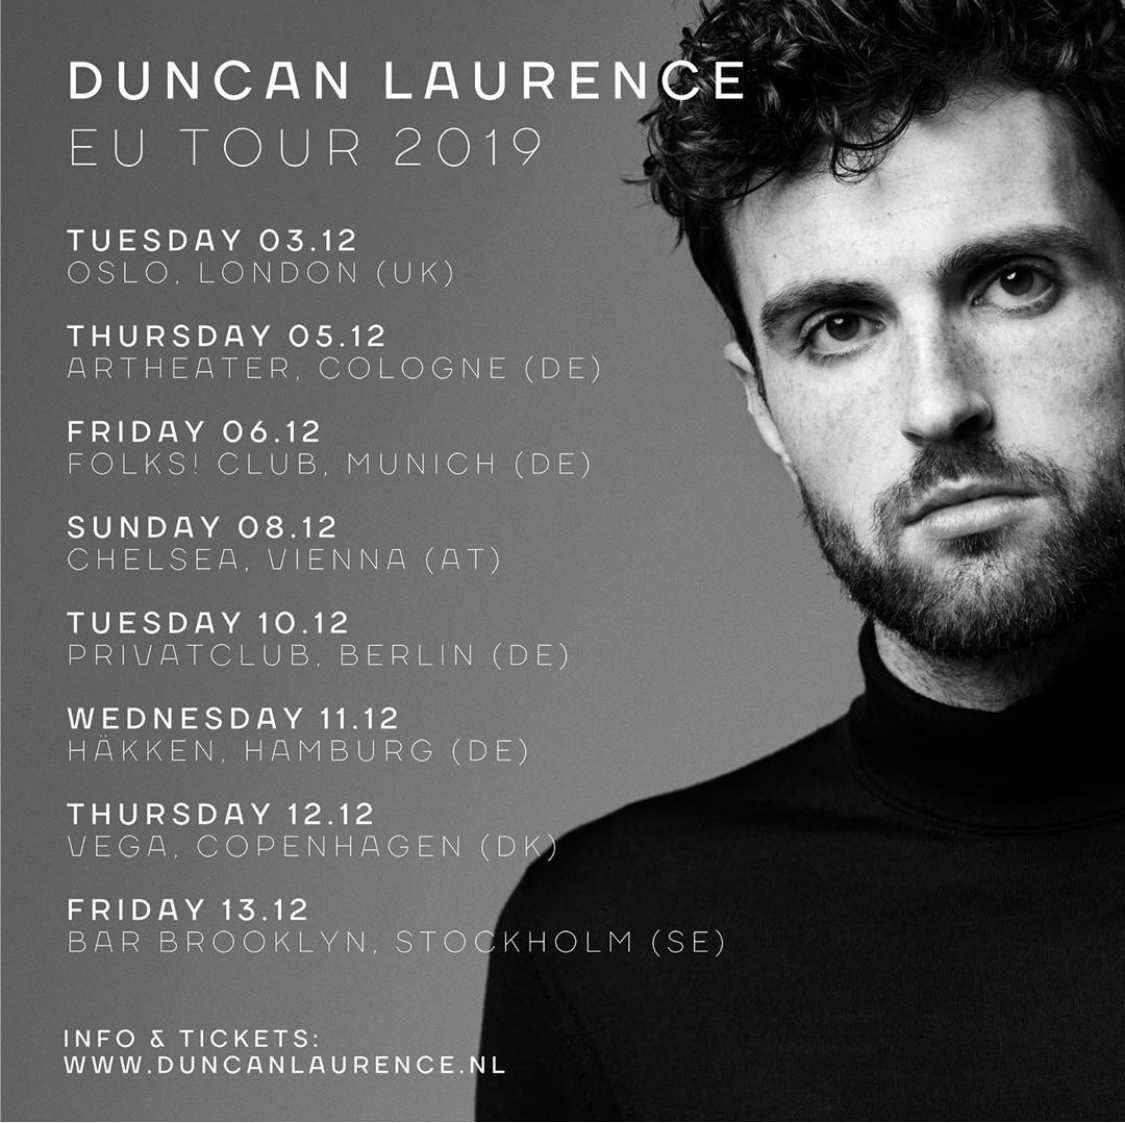 ESC-Sieger Duncan Laurence geht auf Europa-Tour